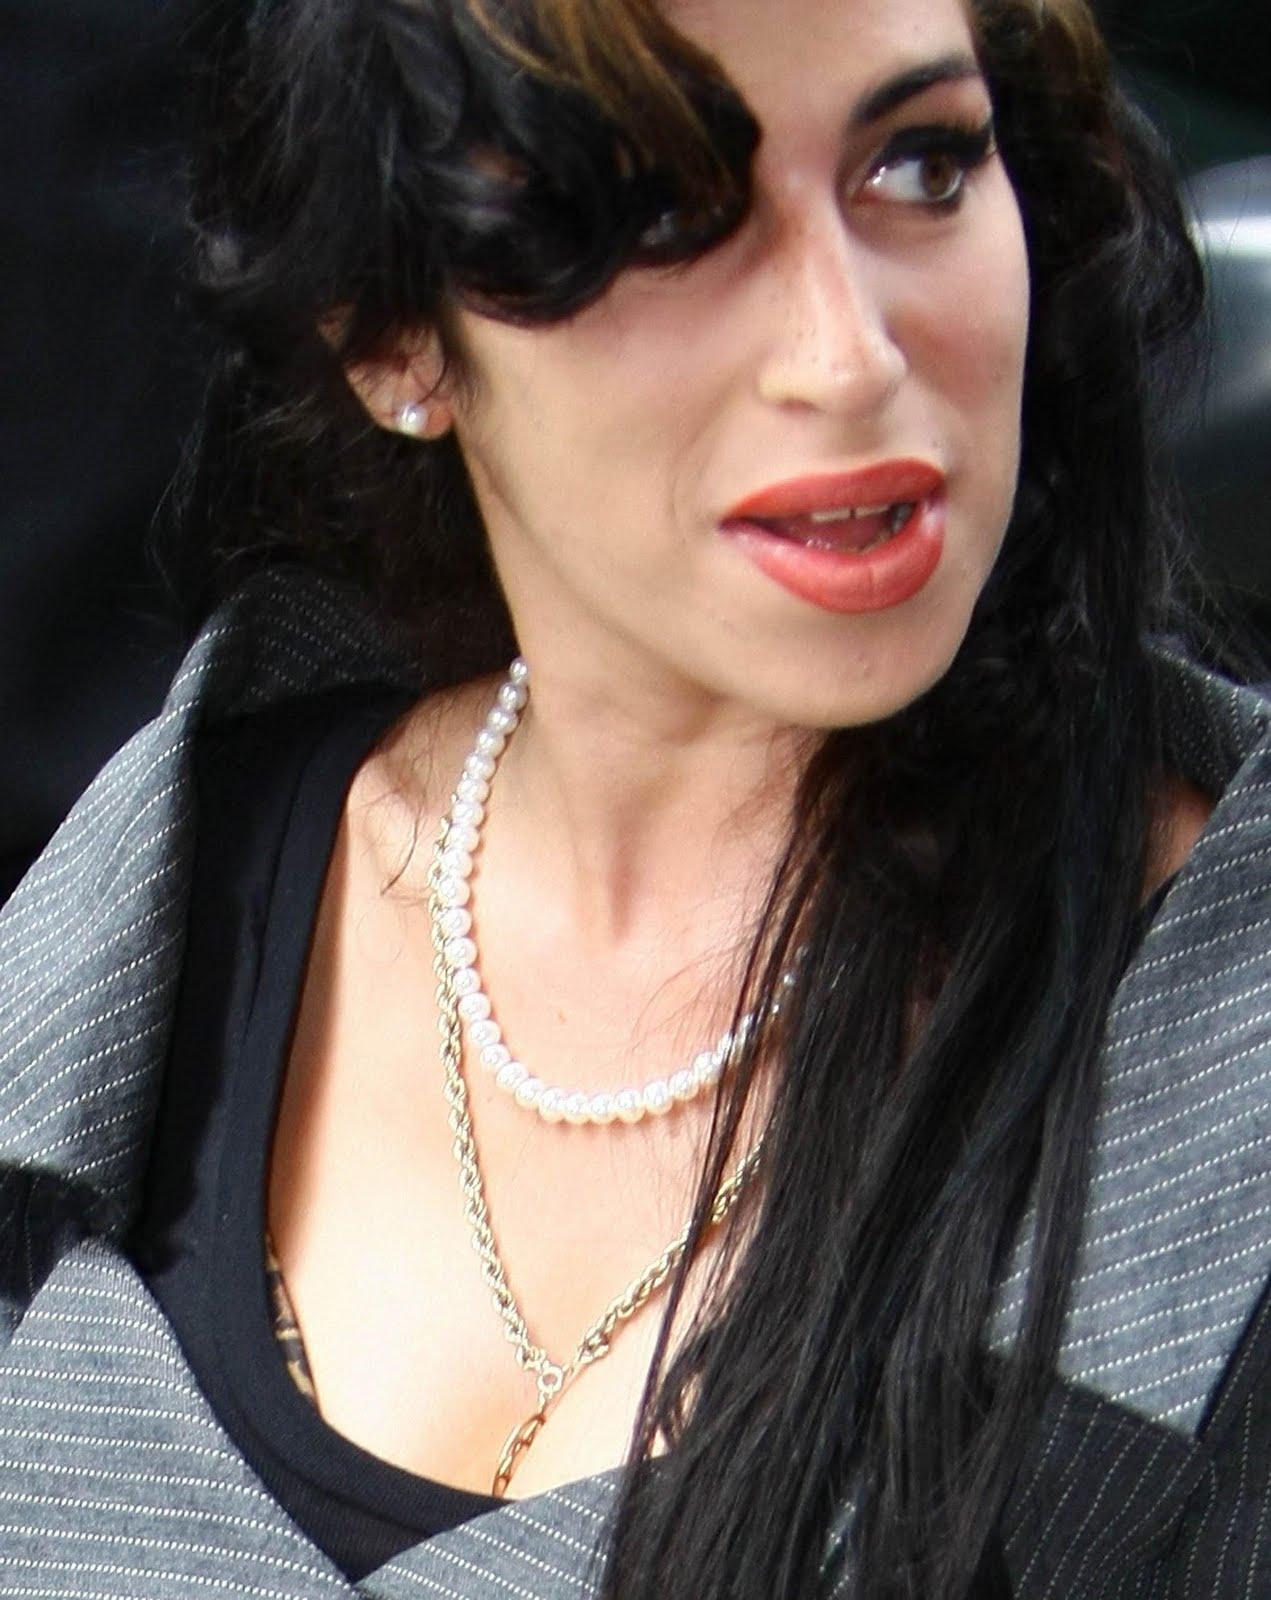 http://3.bp.blogspot.com/-DFBiteyPw08/Tiv3T_kwVFI/AAAAAAAAKOI/Hy-sinWqHr0/s1600/Amy+Winehouse+Pictures.jpg